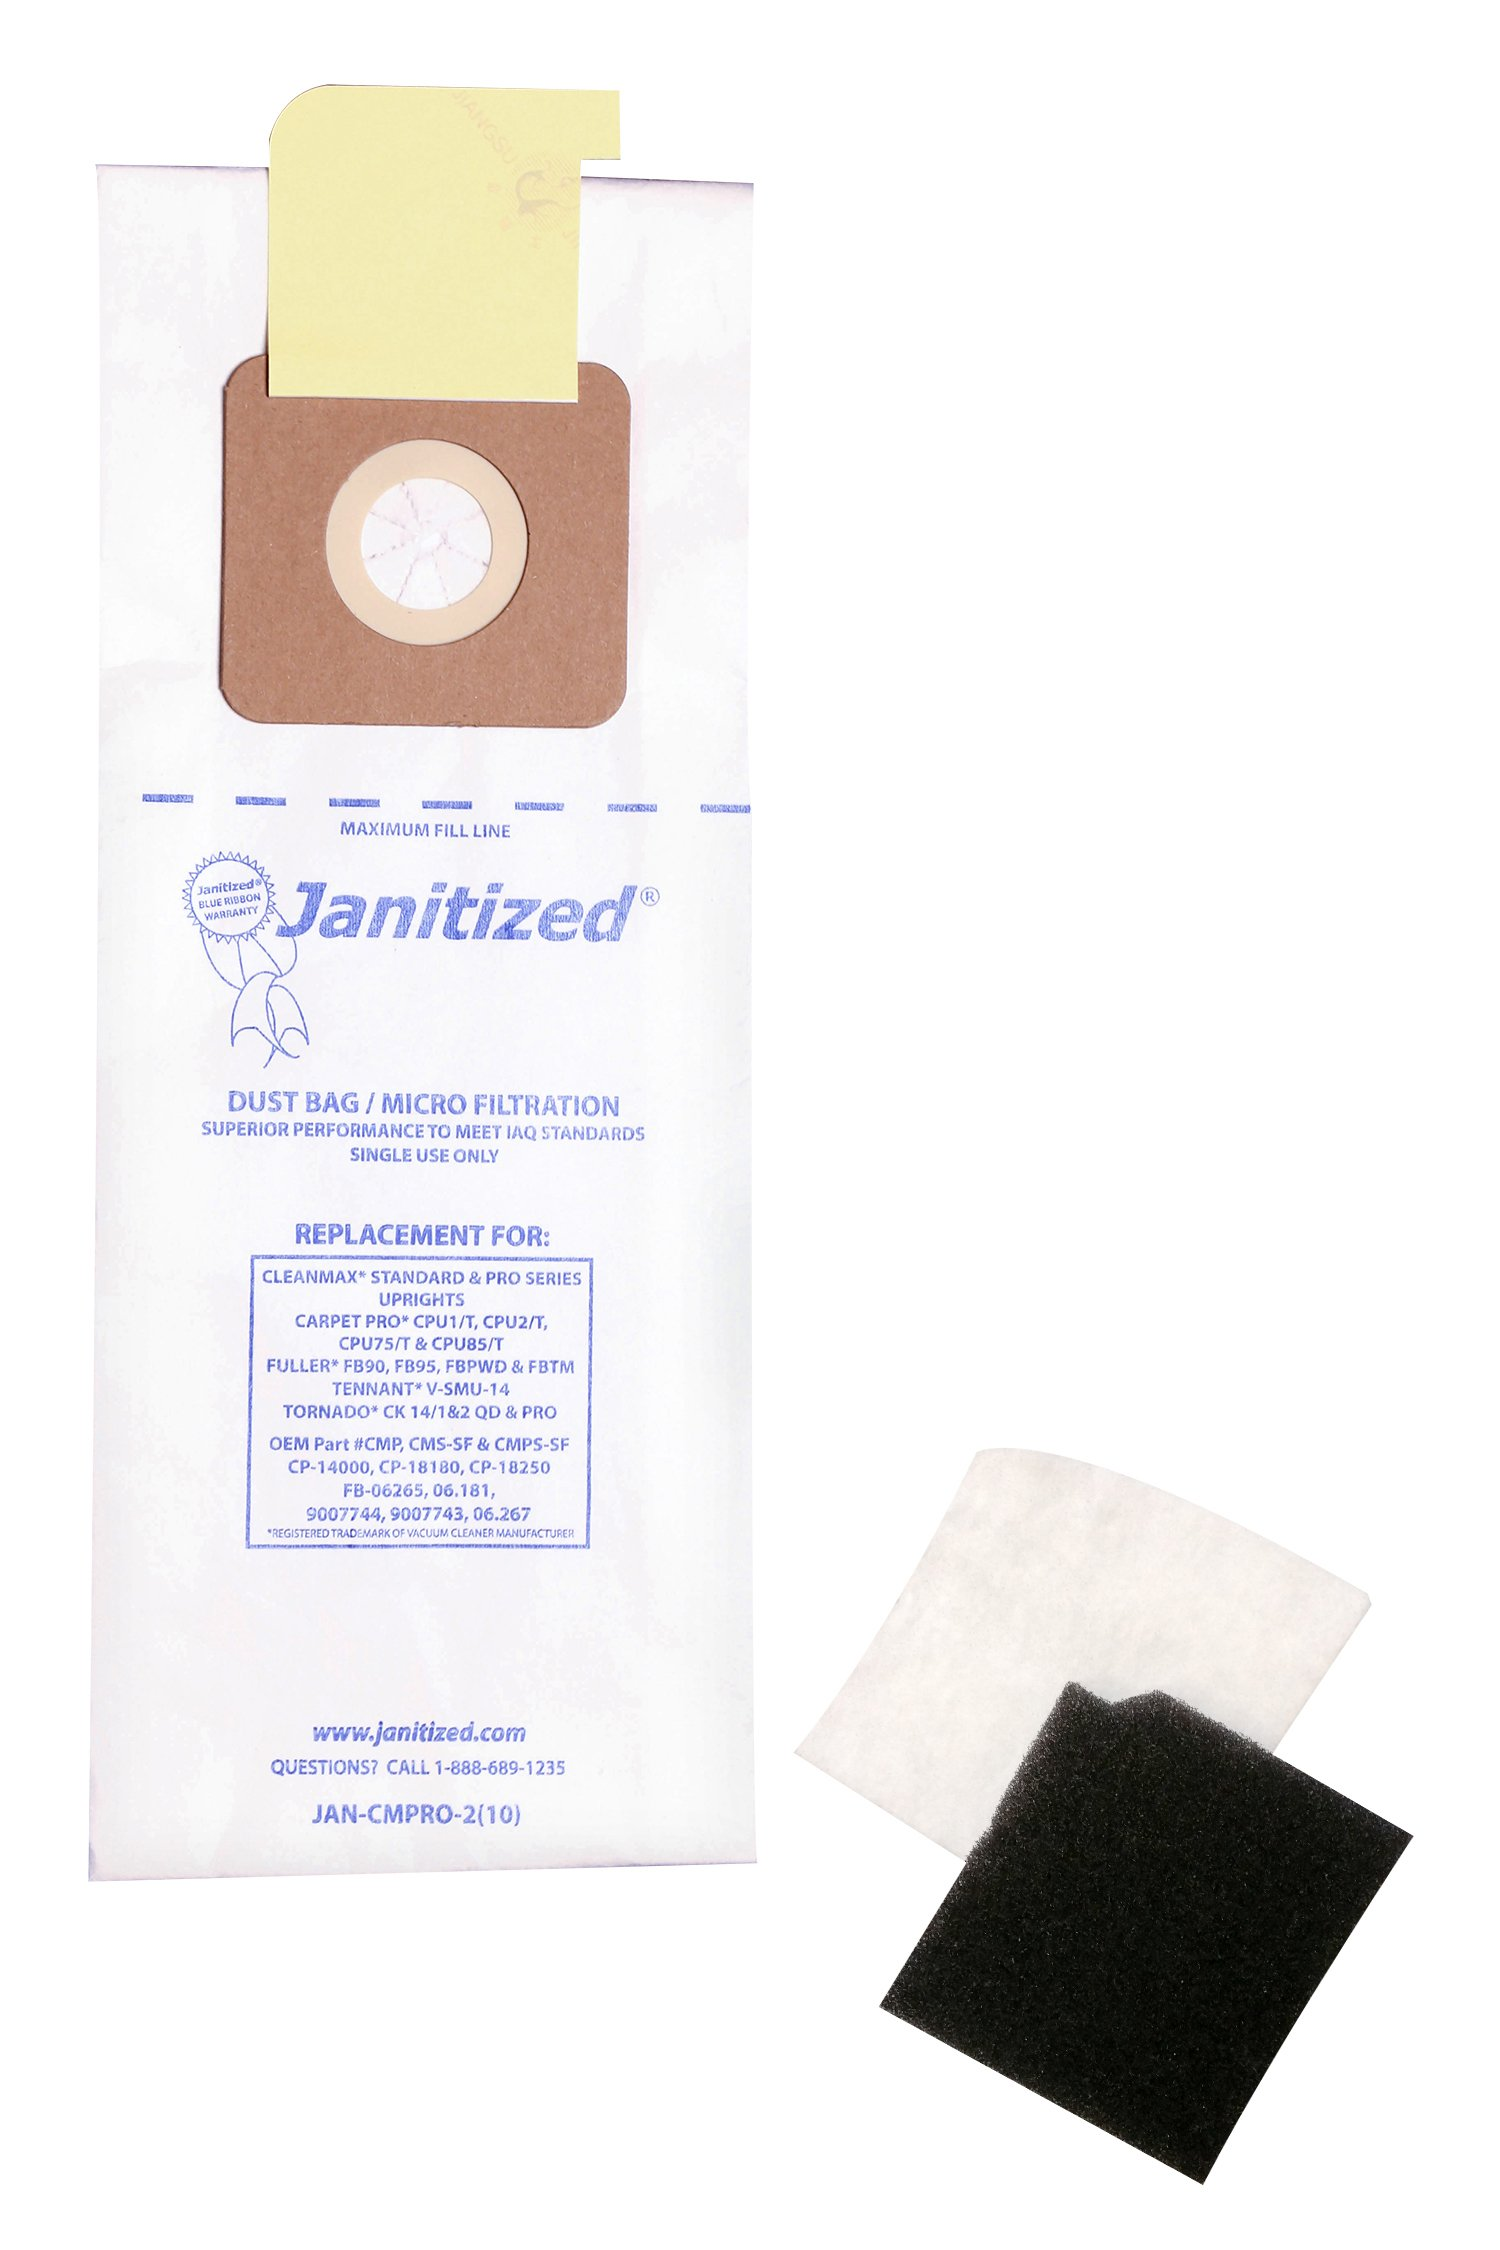 Janitized JAN-CMPRO-2(10) Premium Replacement Commercial Vacuum Paper Bag for CleanMax Pro, Tennant V-SMU-14, Tornado CK 14, Carpet Pro CPU, OEM #CMP, CMS, CMPS, 06.267 (Pack of 10)